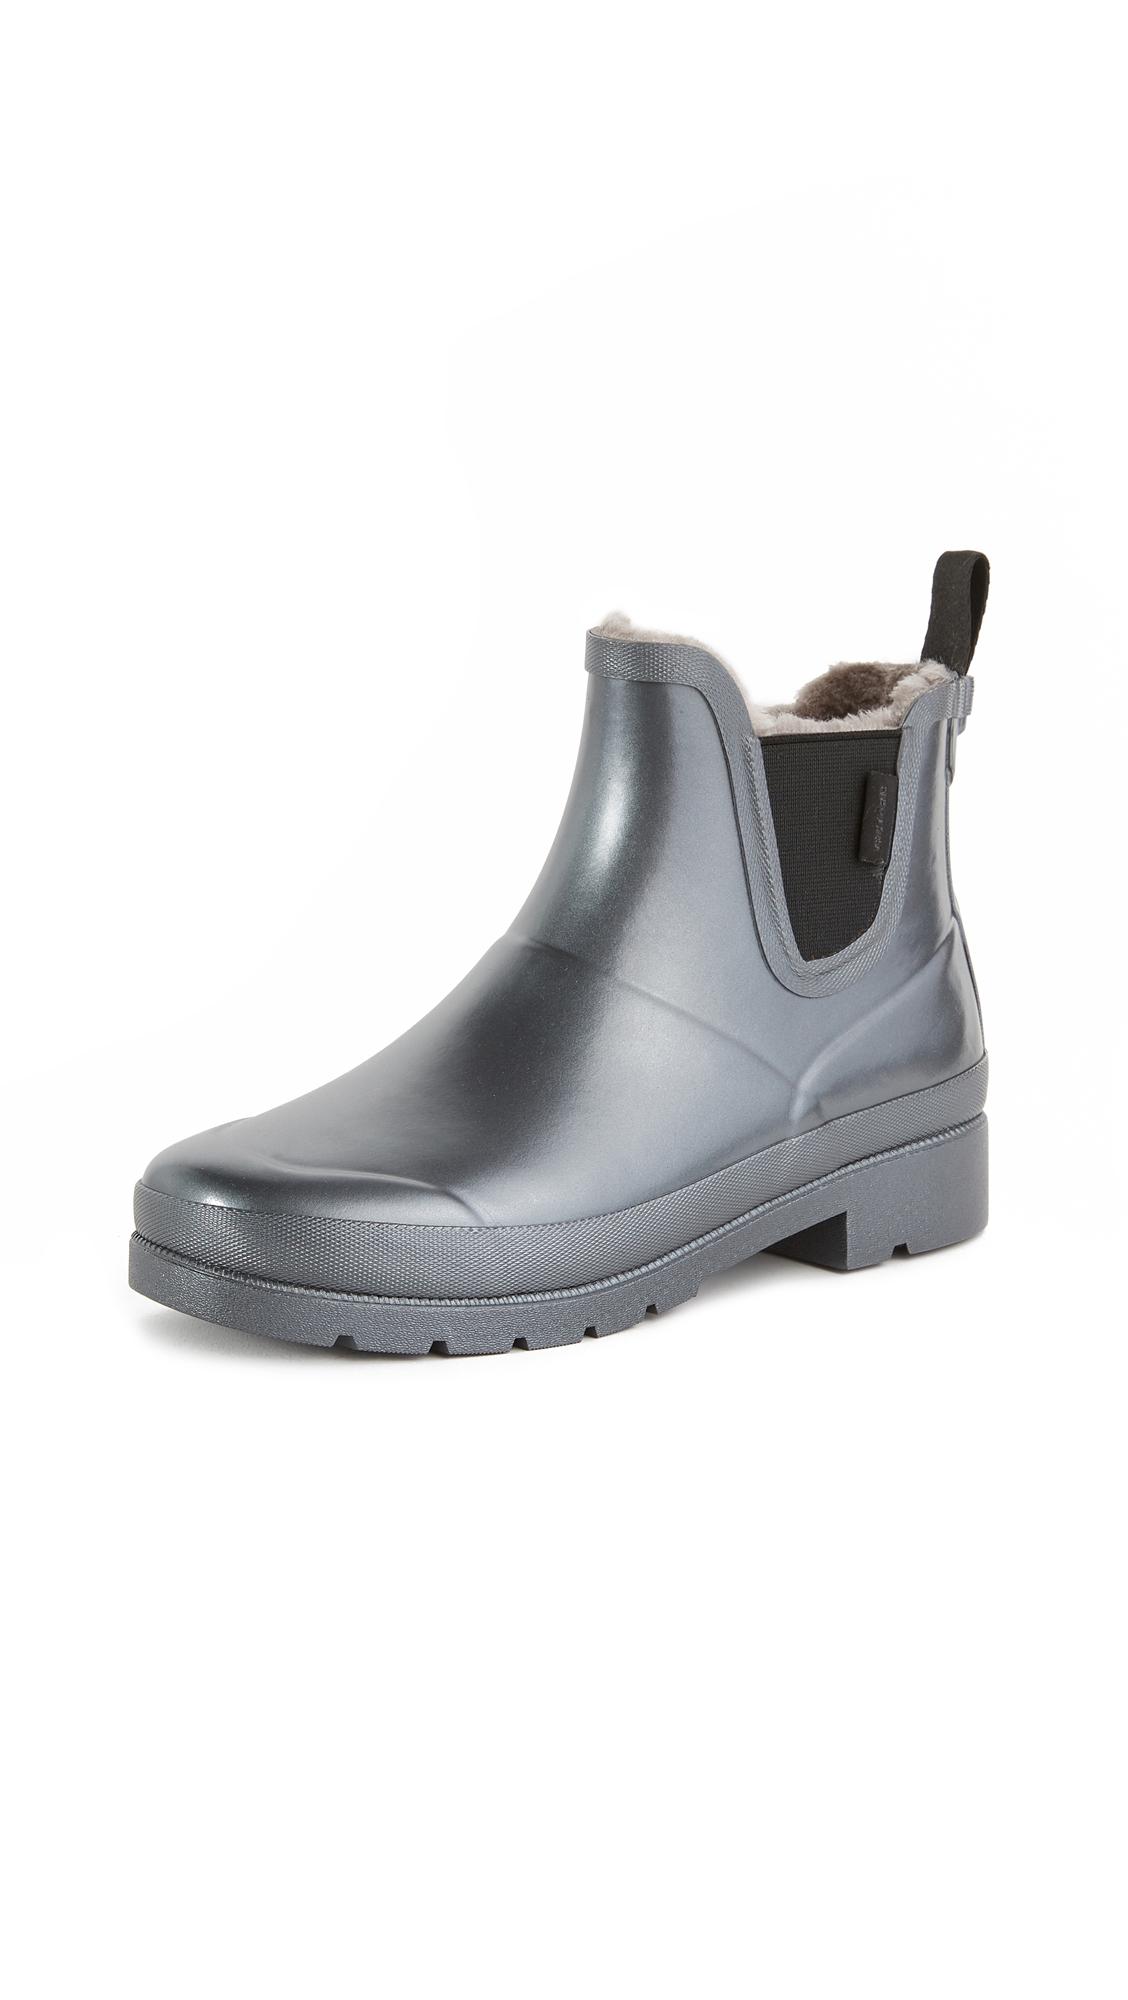 Tretorn Lina Faux Fur Rain Booties - Silver/Silver